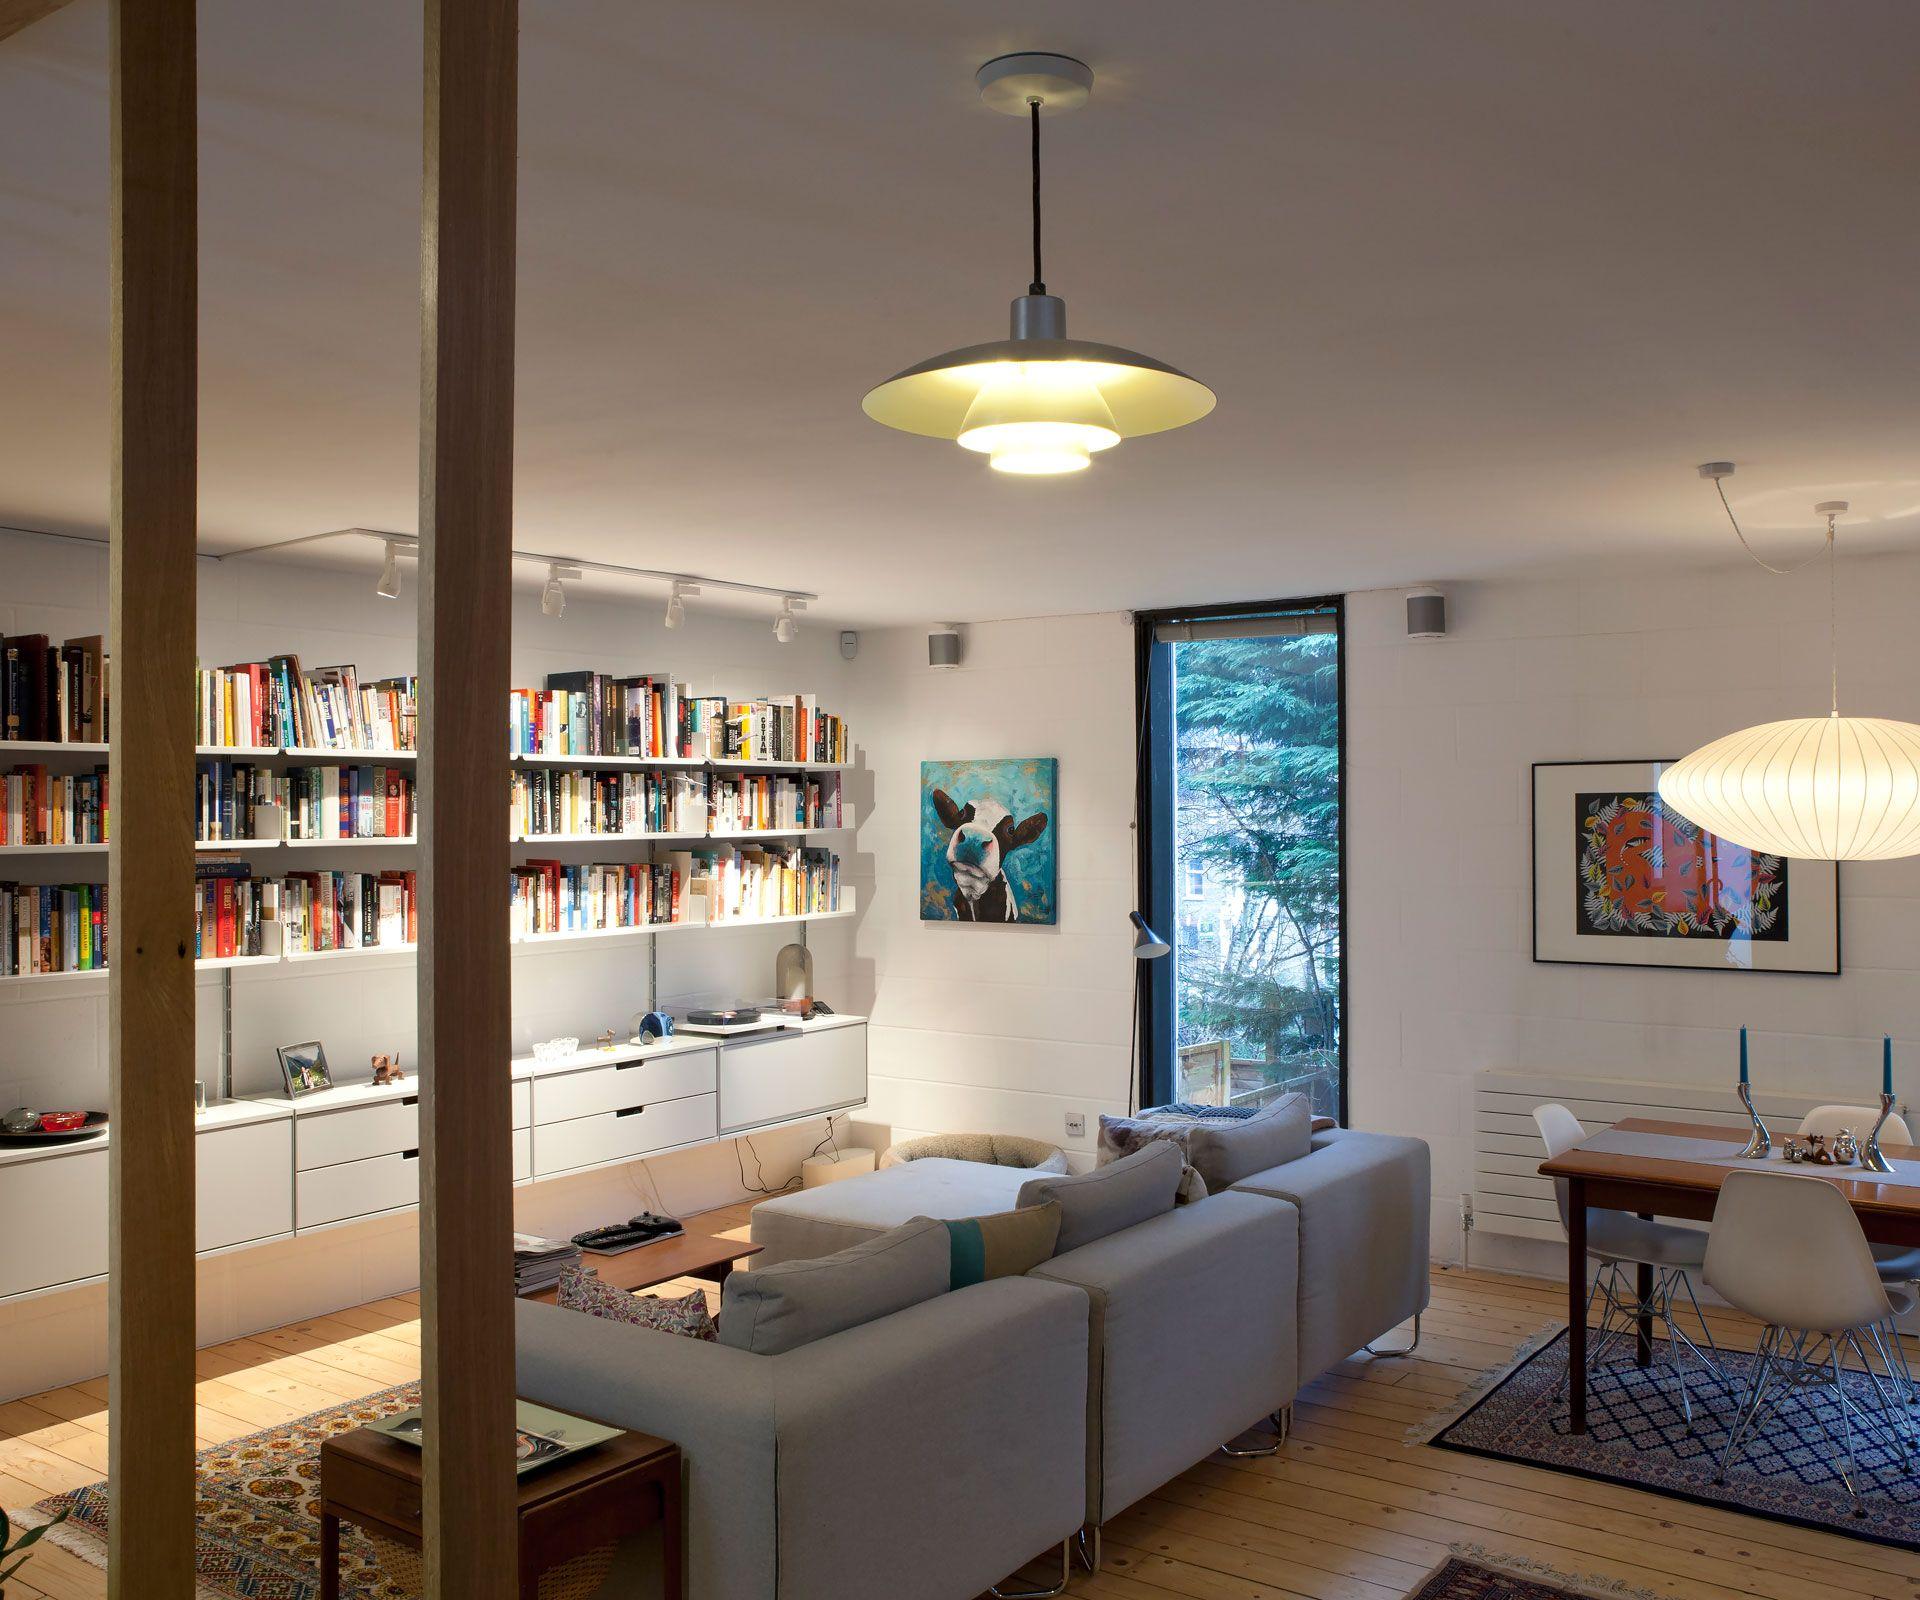 Celebrated New Zealand architect Peter Beaven's London